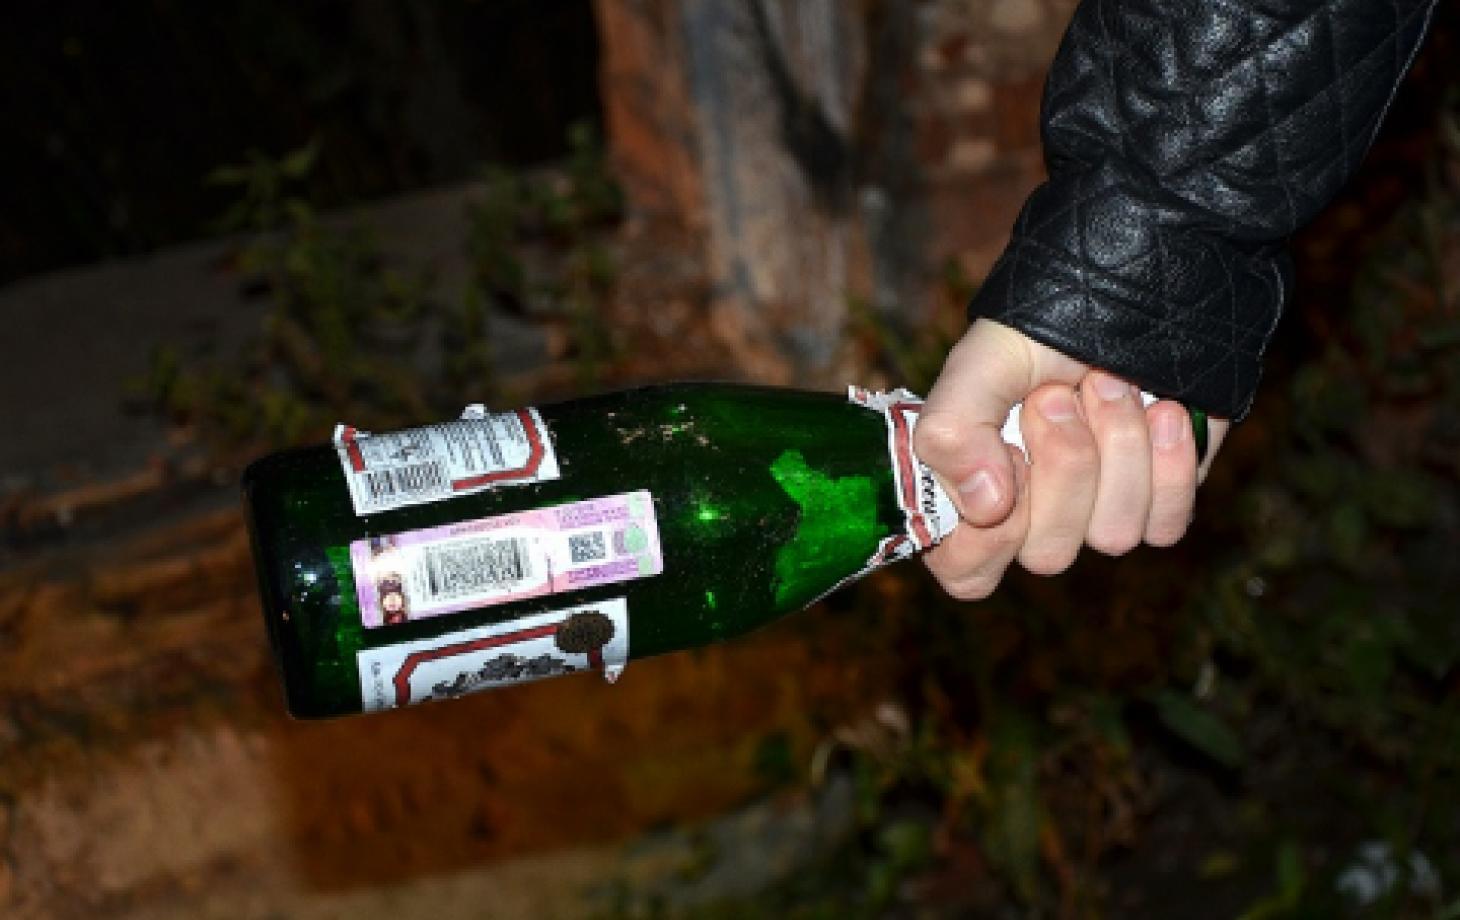 Фото девушки с битой бутылкой